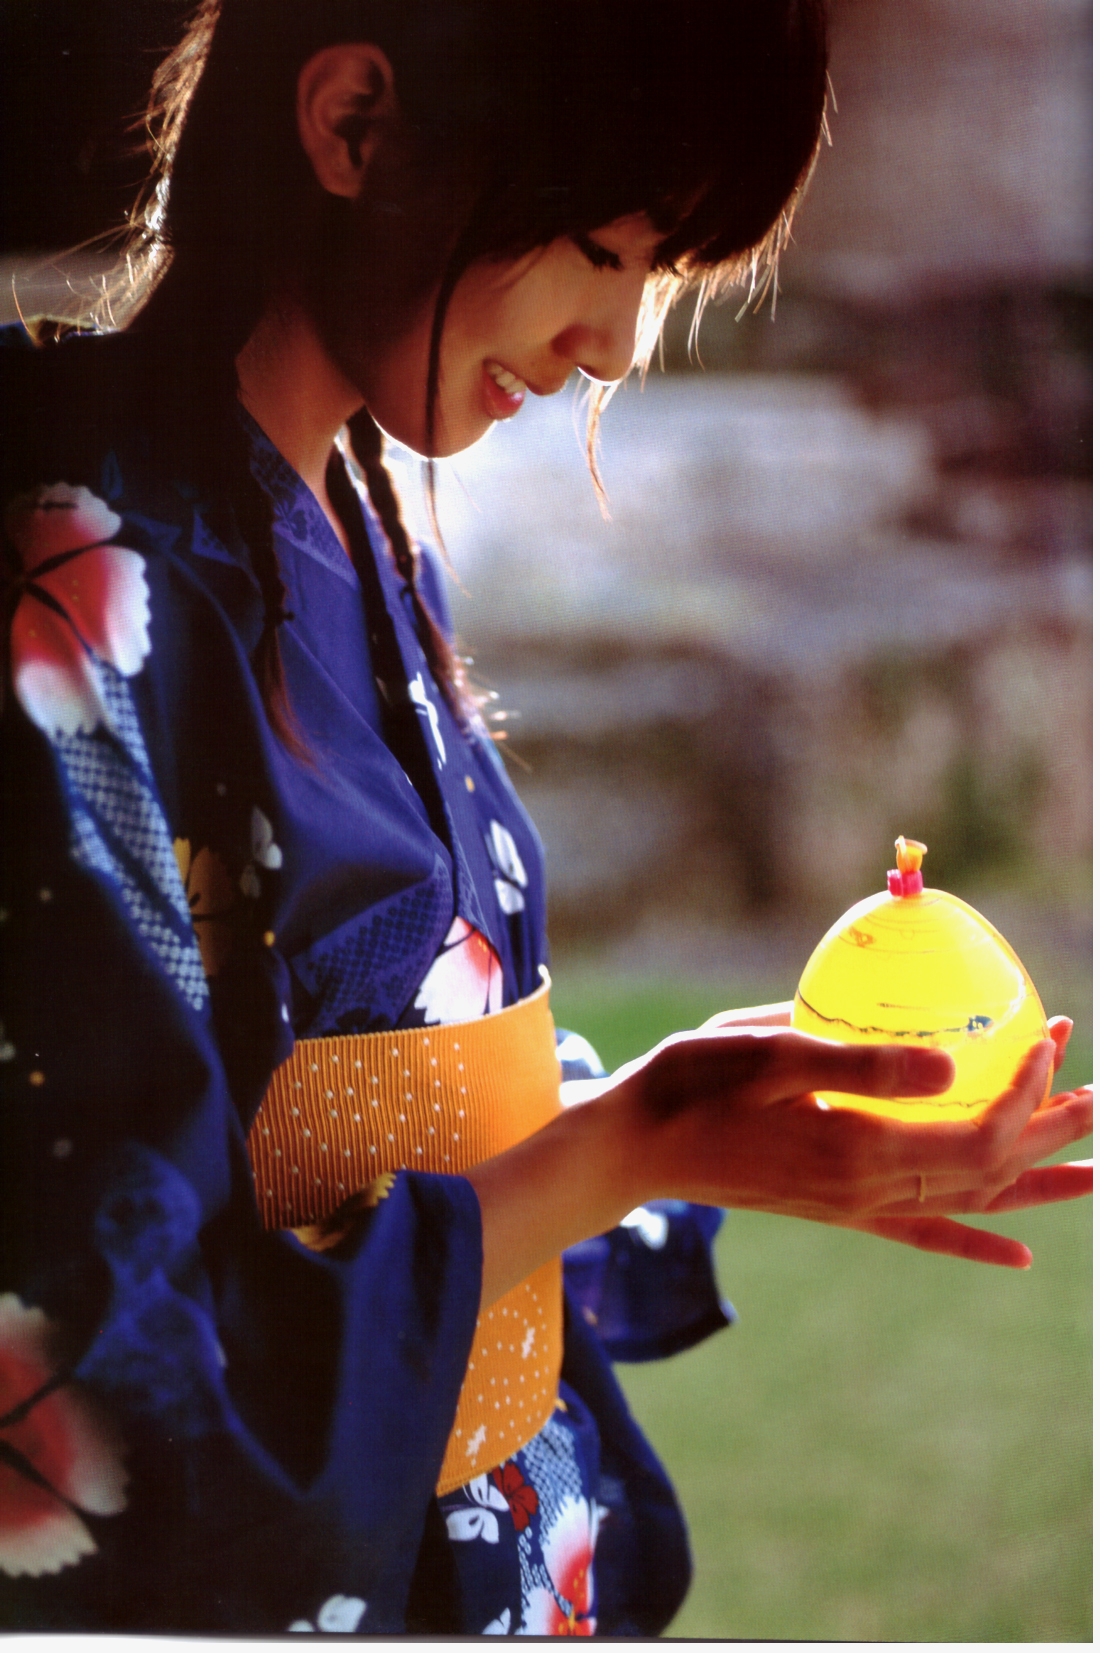 2010 rankings top 5 songs to hum along kumbaya nyu chan desu